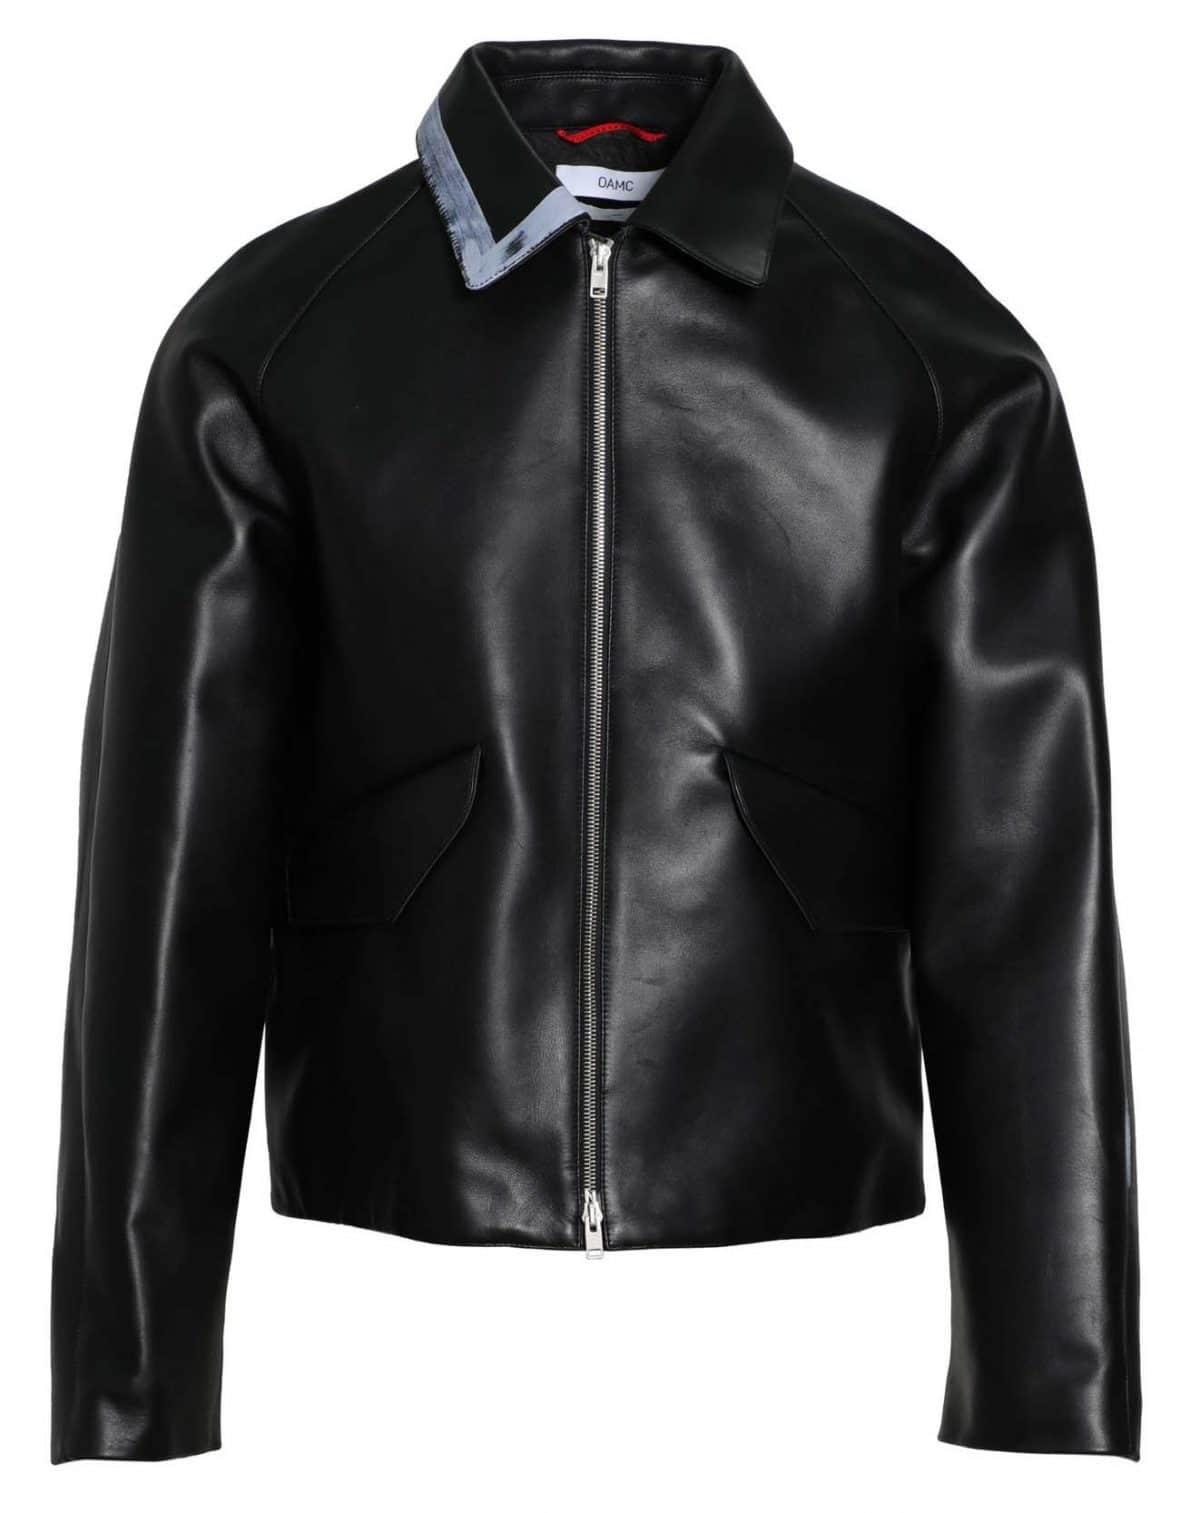 OAMC Painted Leather Jacket